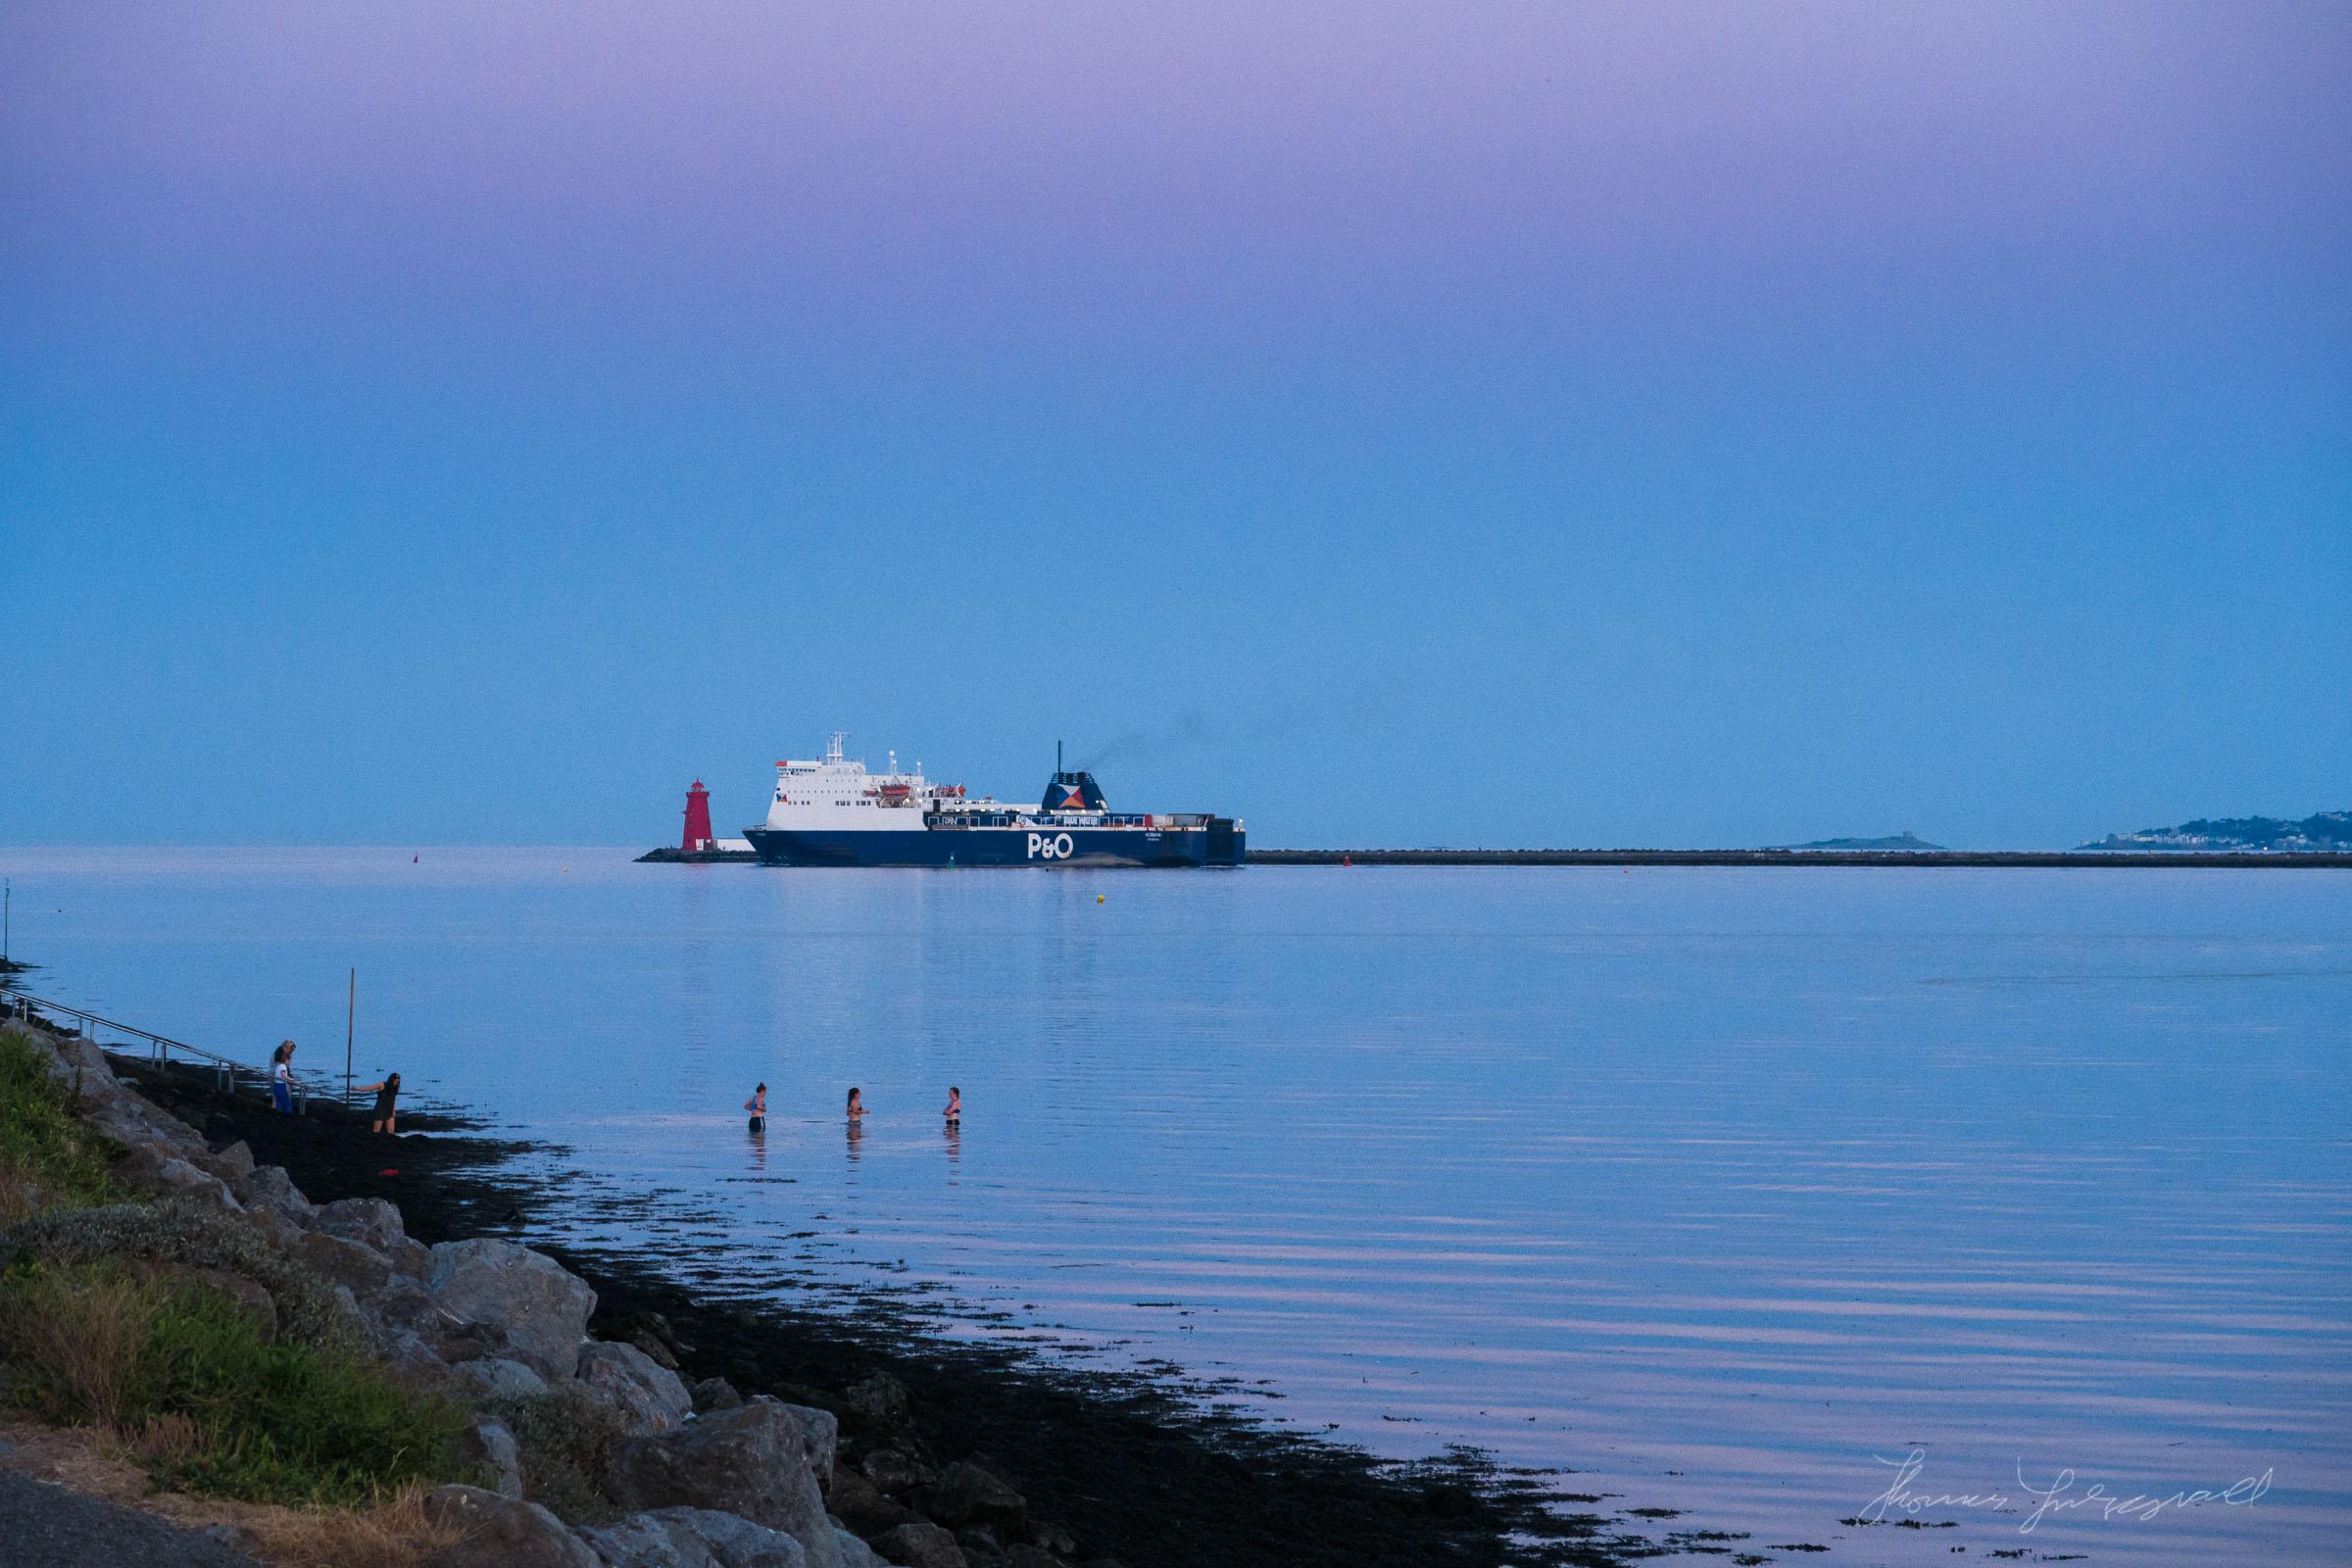 P&O Ferry leaving Dublin Port